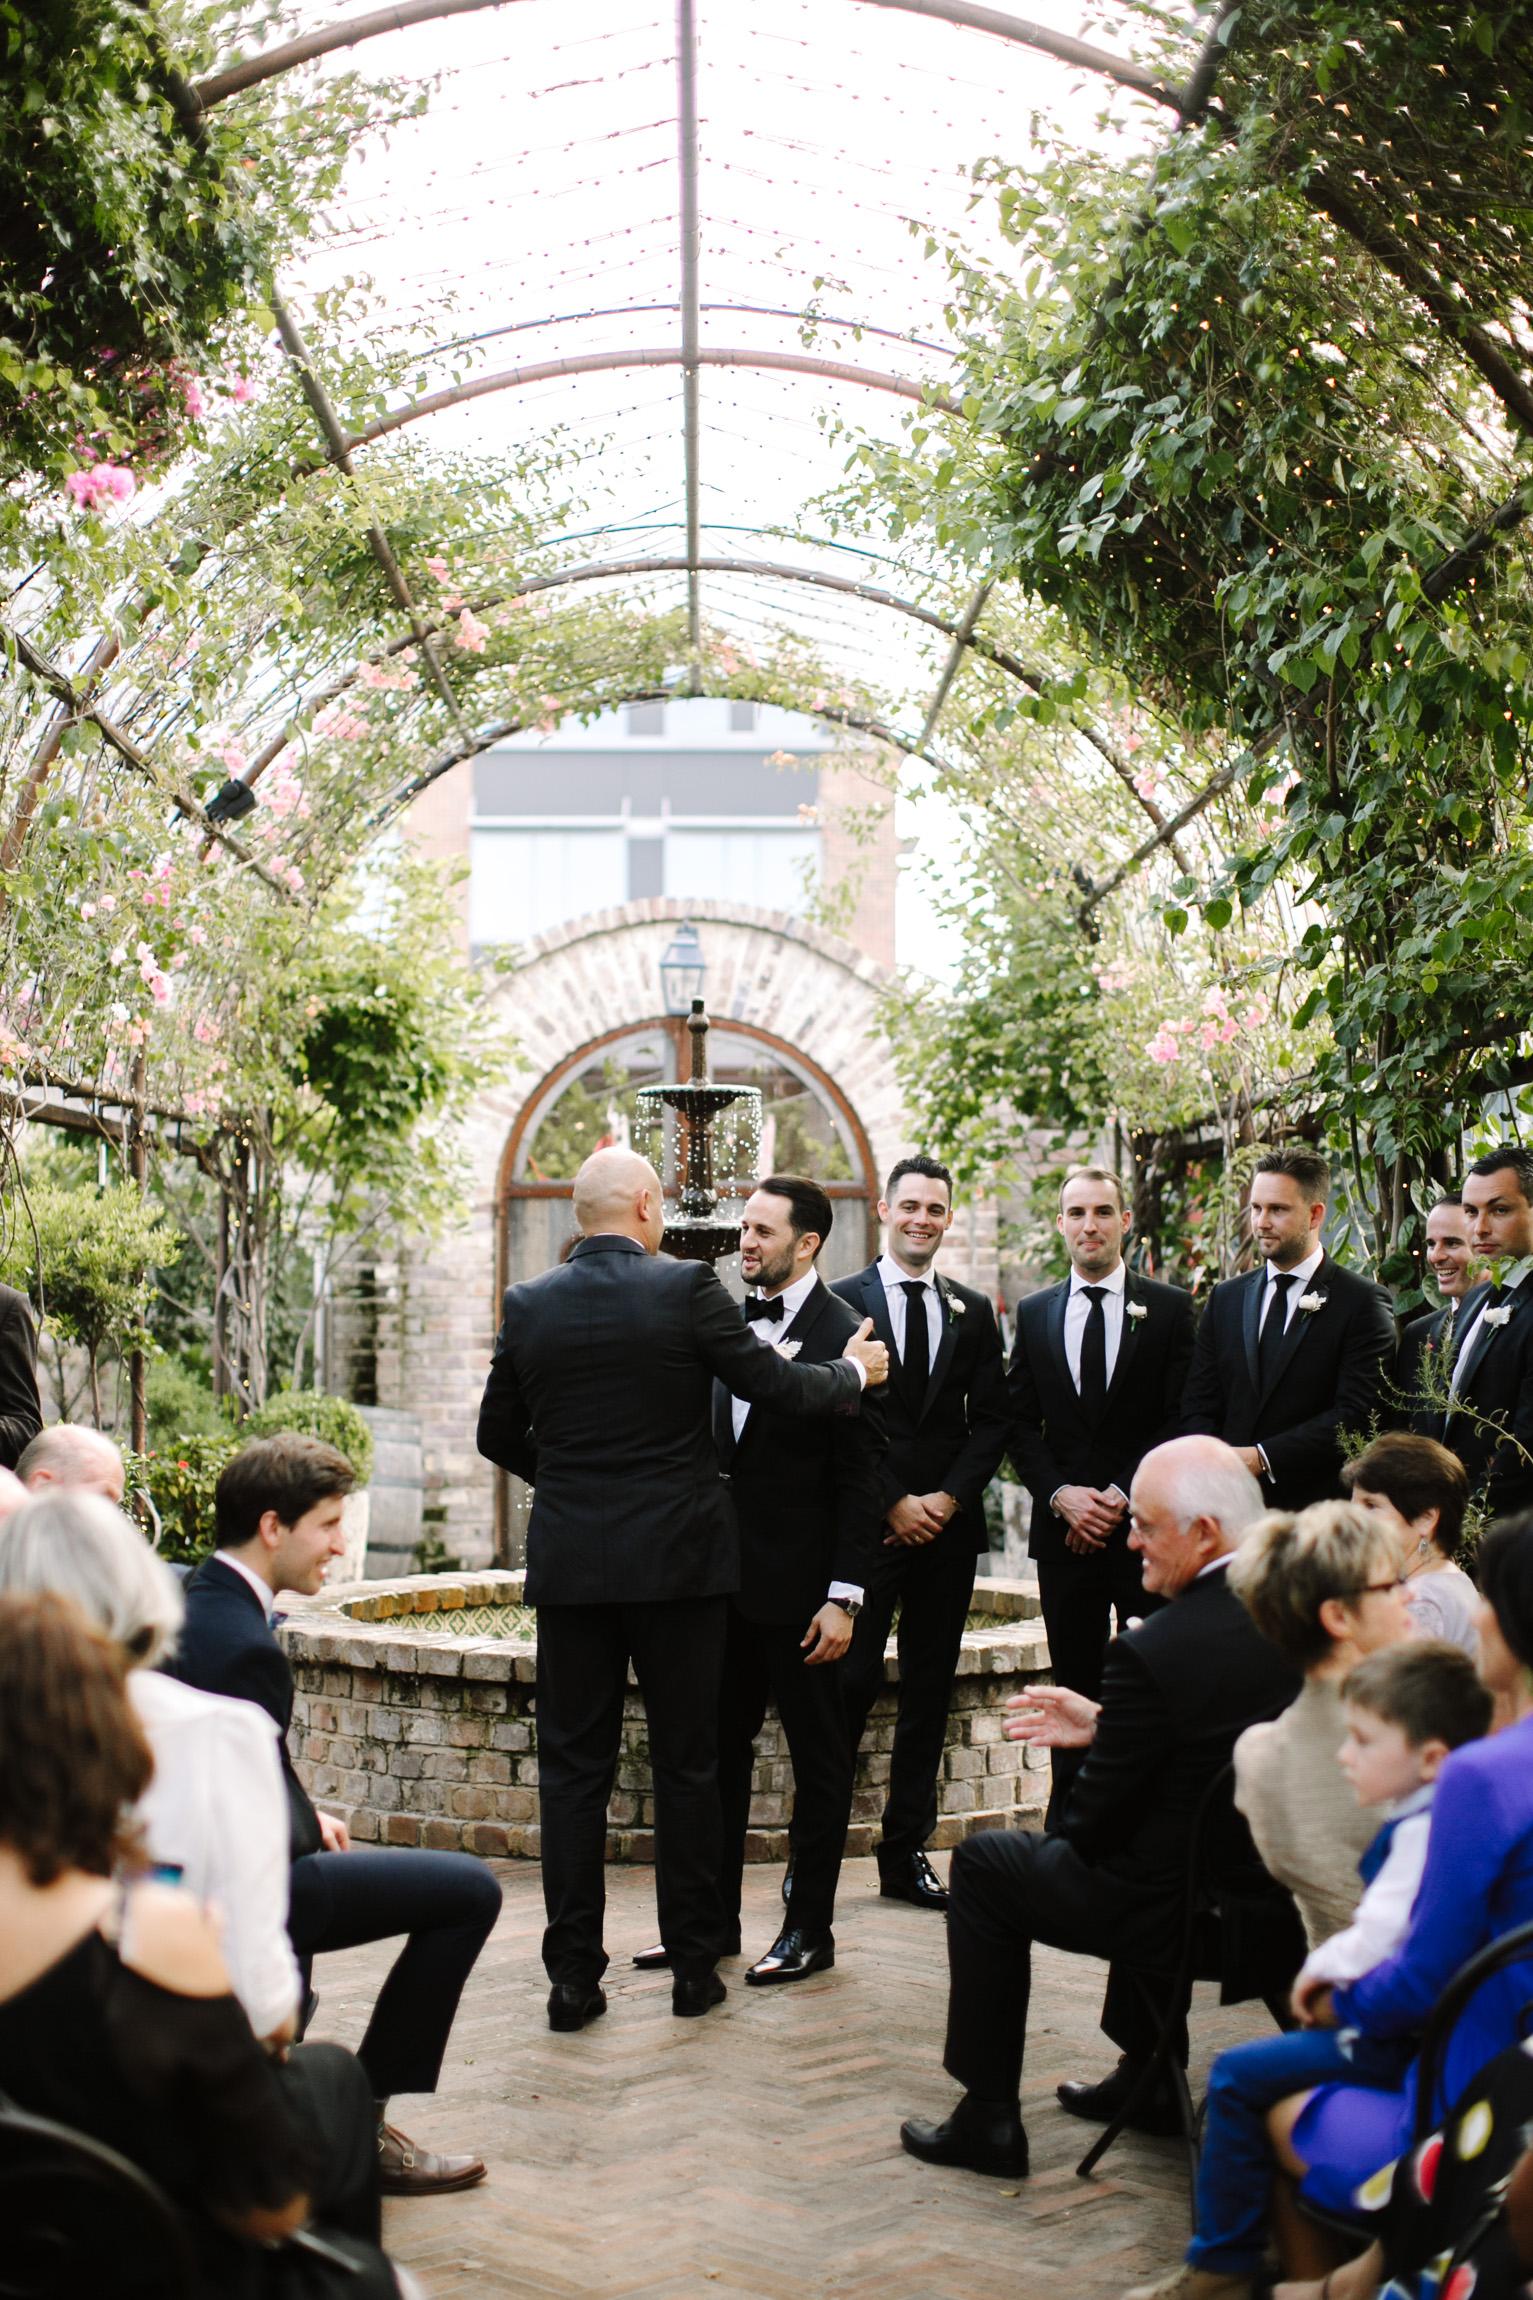 180223_justinaaron_wedding_charlotte_david_h-89.jpg